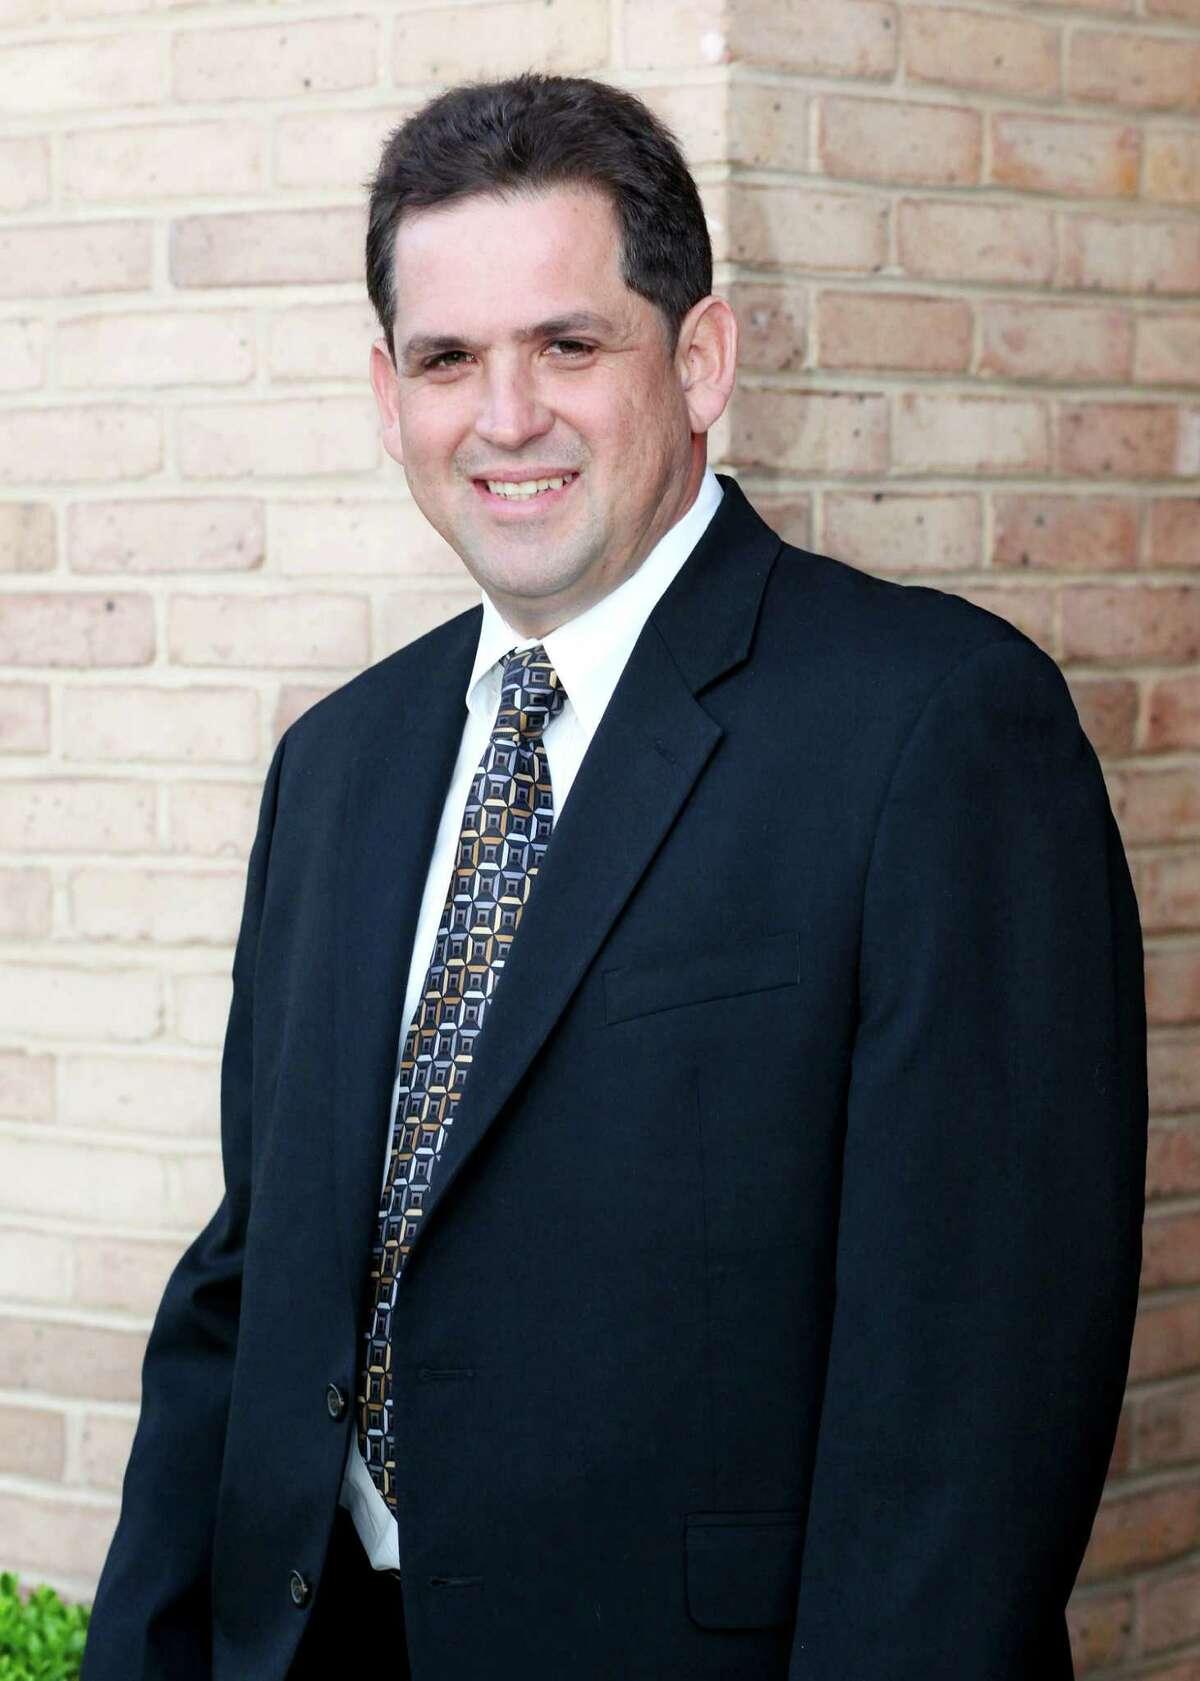 Chris Diaz, Democratic candidate for Harris County Precinct 2 Constable.